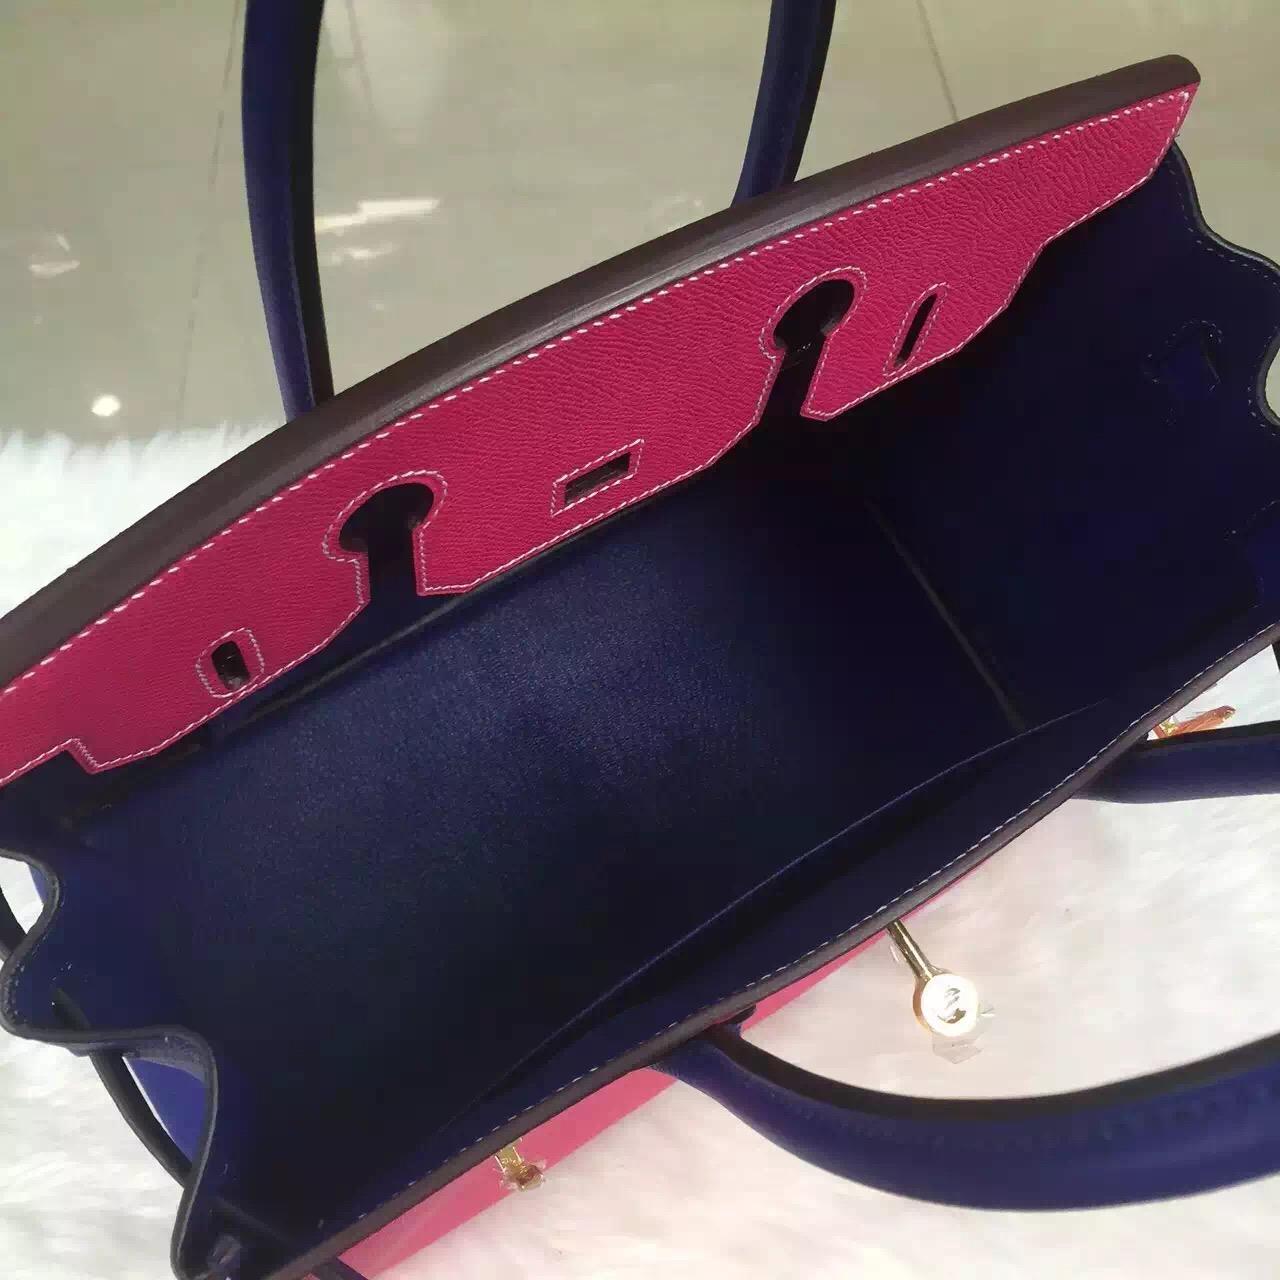 Discount Hermes E5 Candy Pink/7T Blue Electric Epsom Leather Birkin Bag 30CM